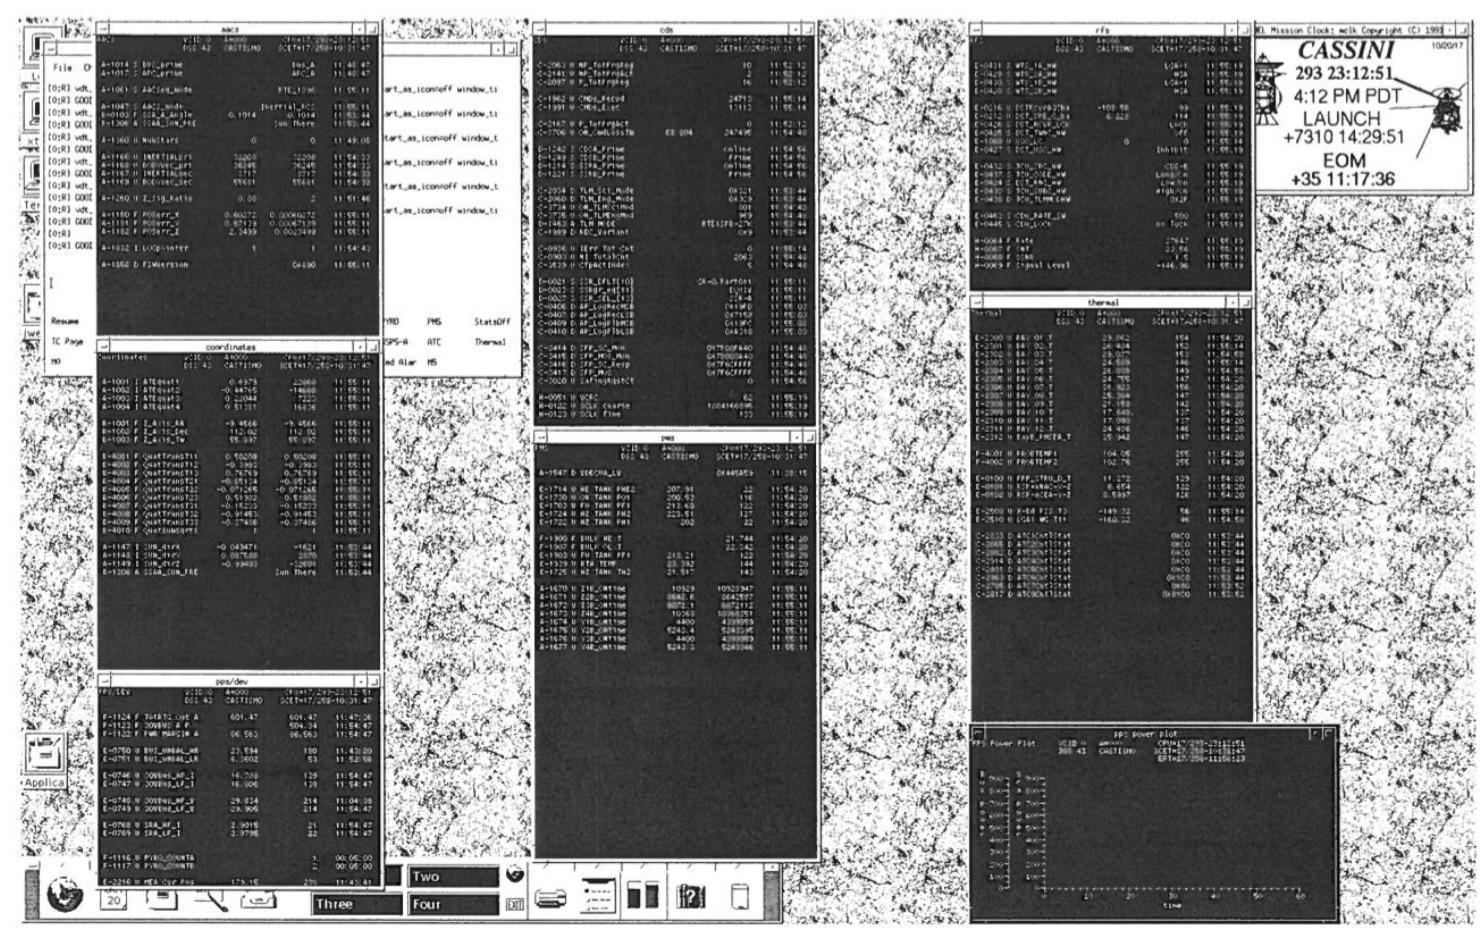 Julie's view of her desktop while she was monitoring Cassini's telemetry.  Credit: Julie Webster